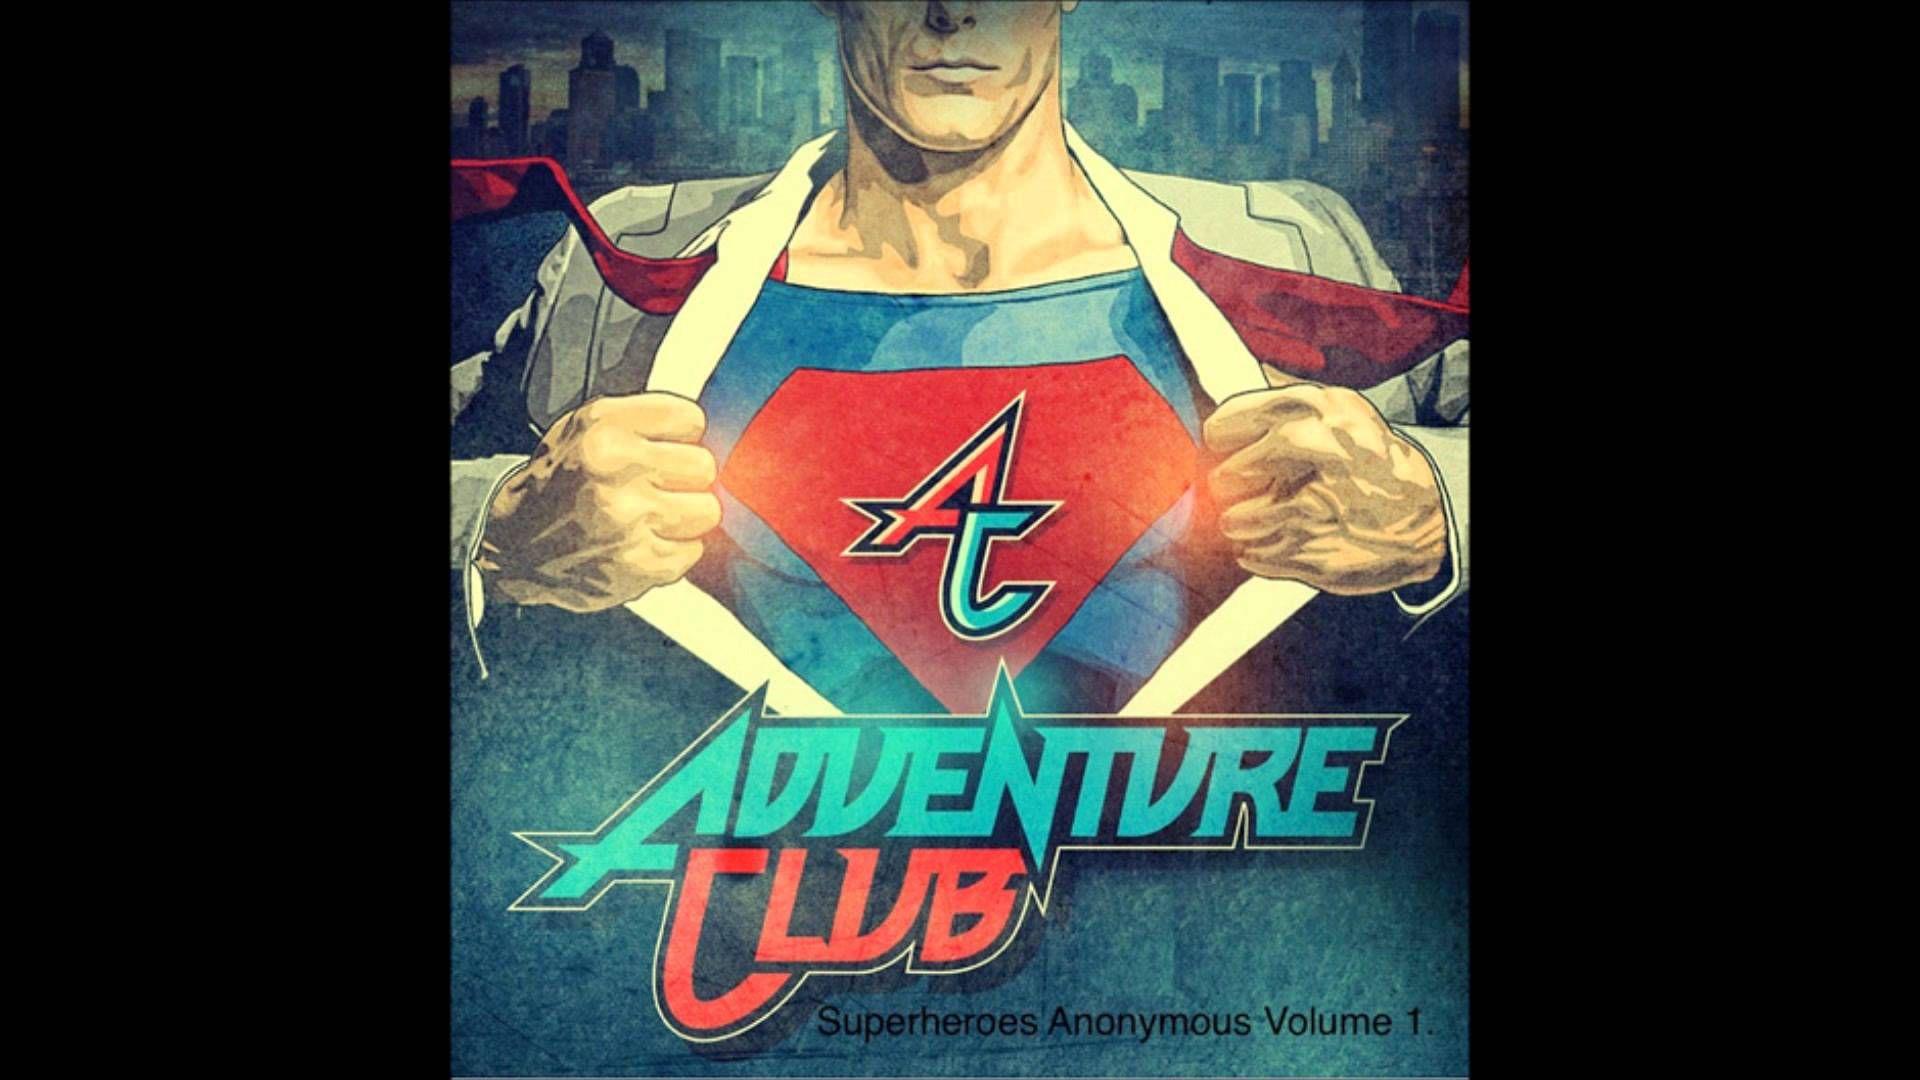 Adventure Club Superheroes Anonymous Vol 1 Free Download